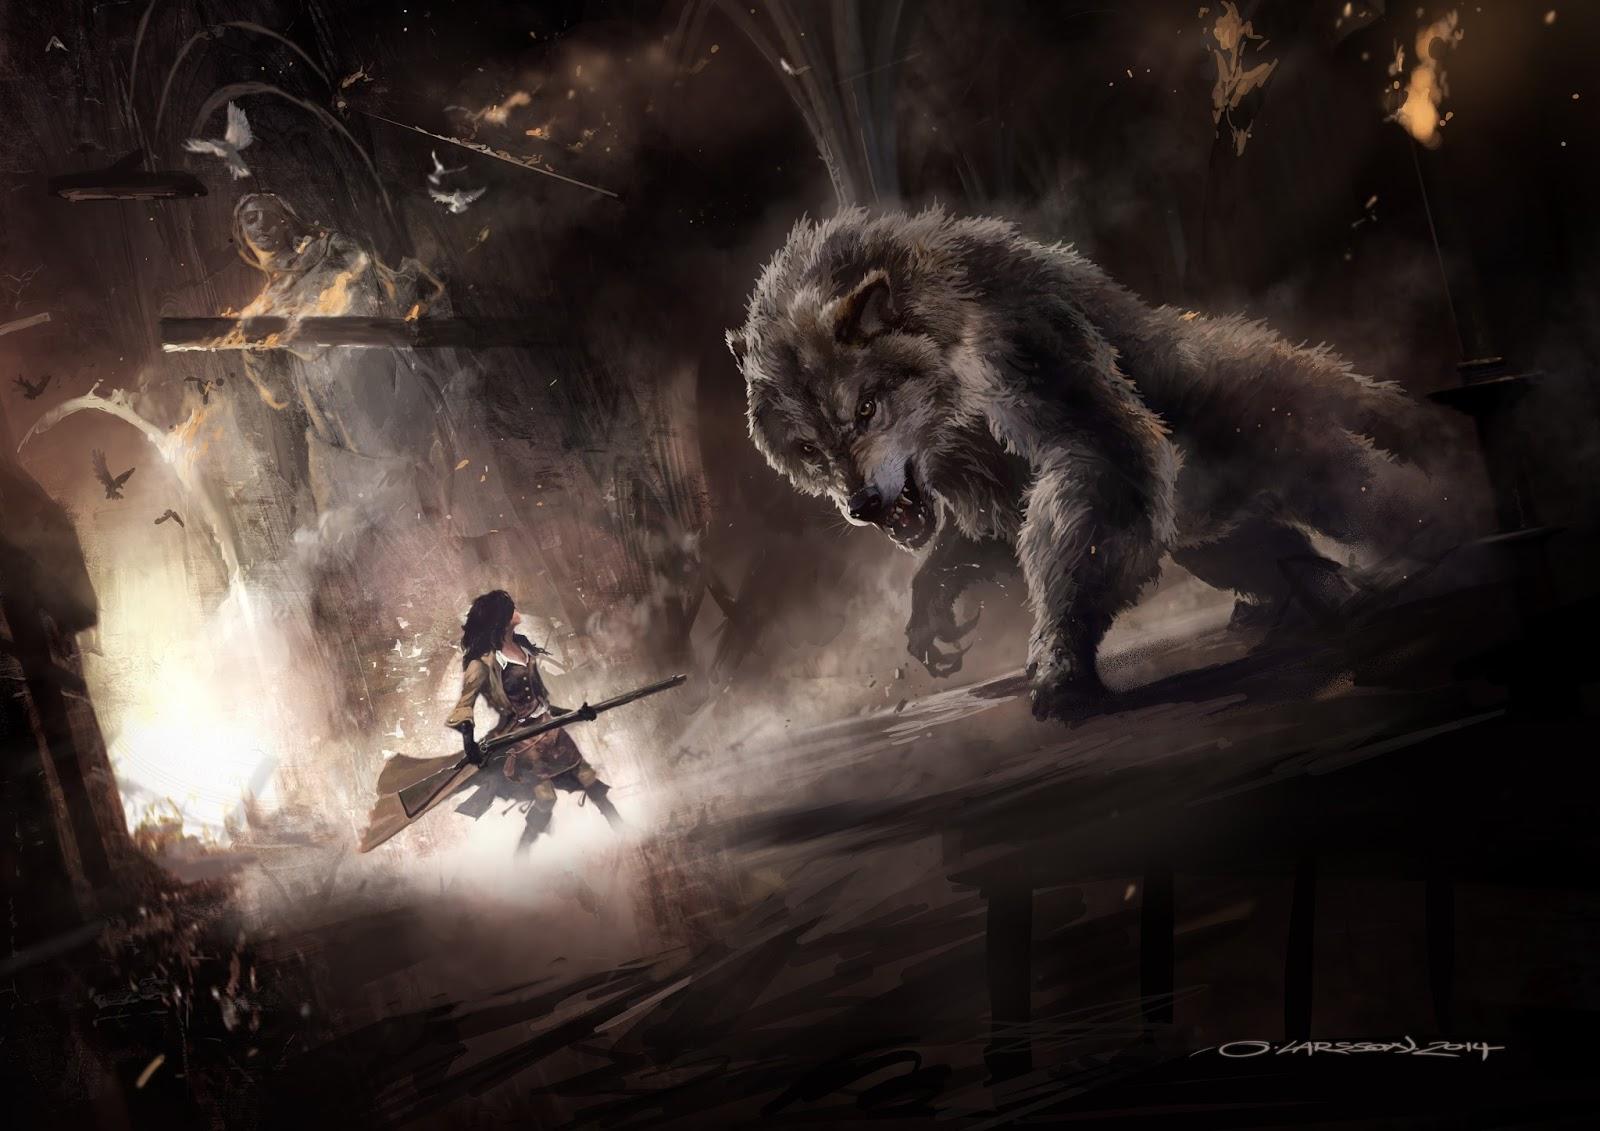 Götterdämmerung RPG (Image: Riotminds)